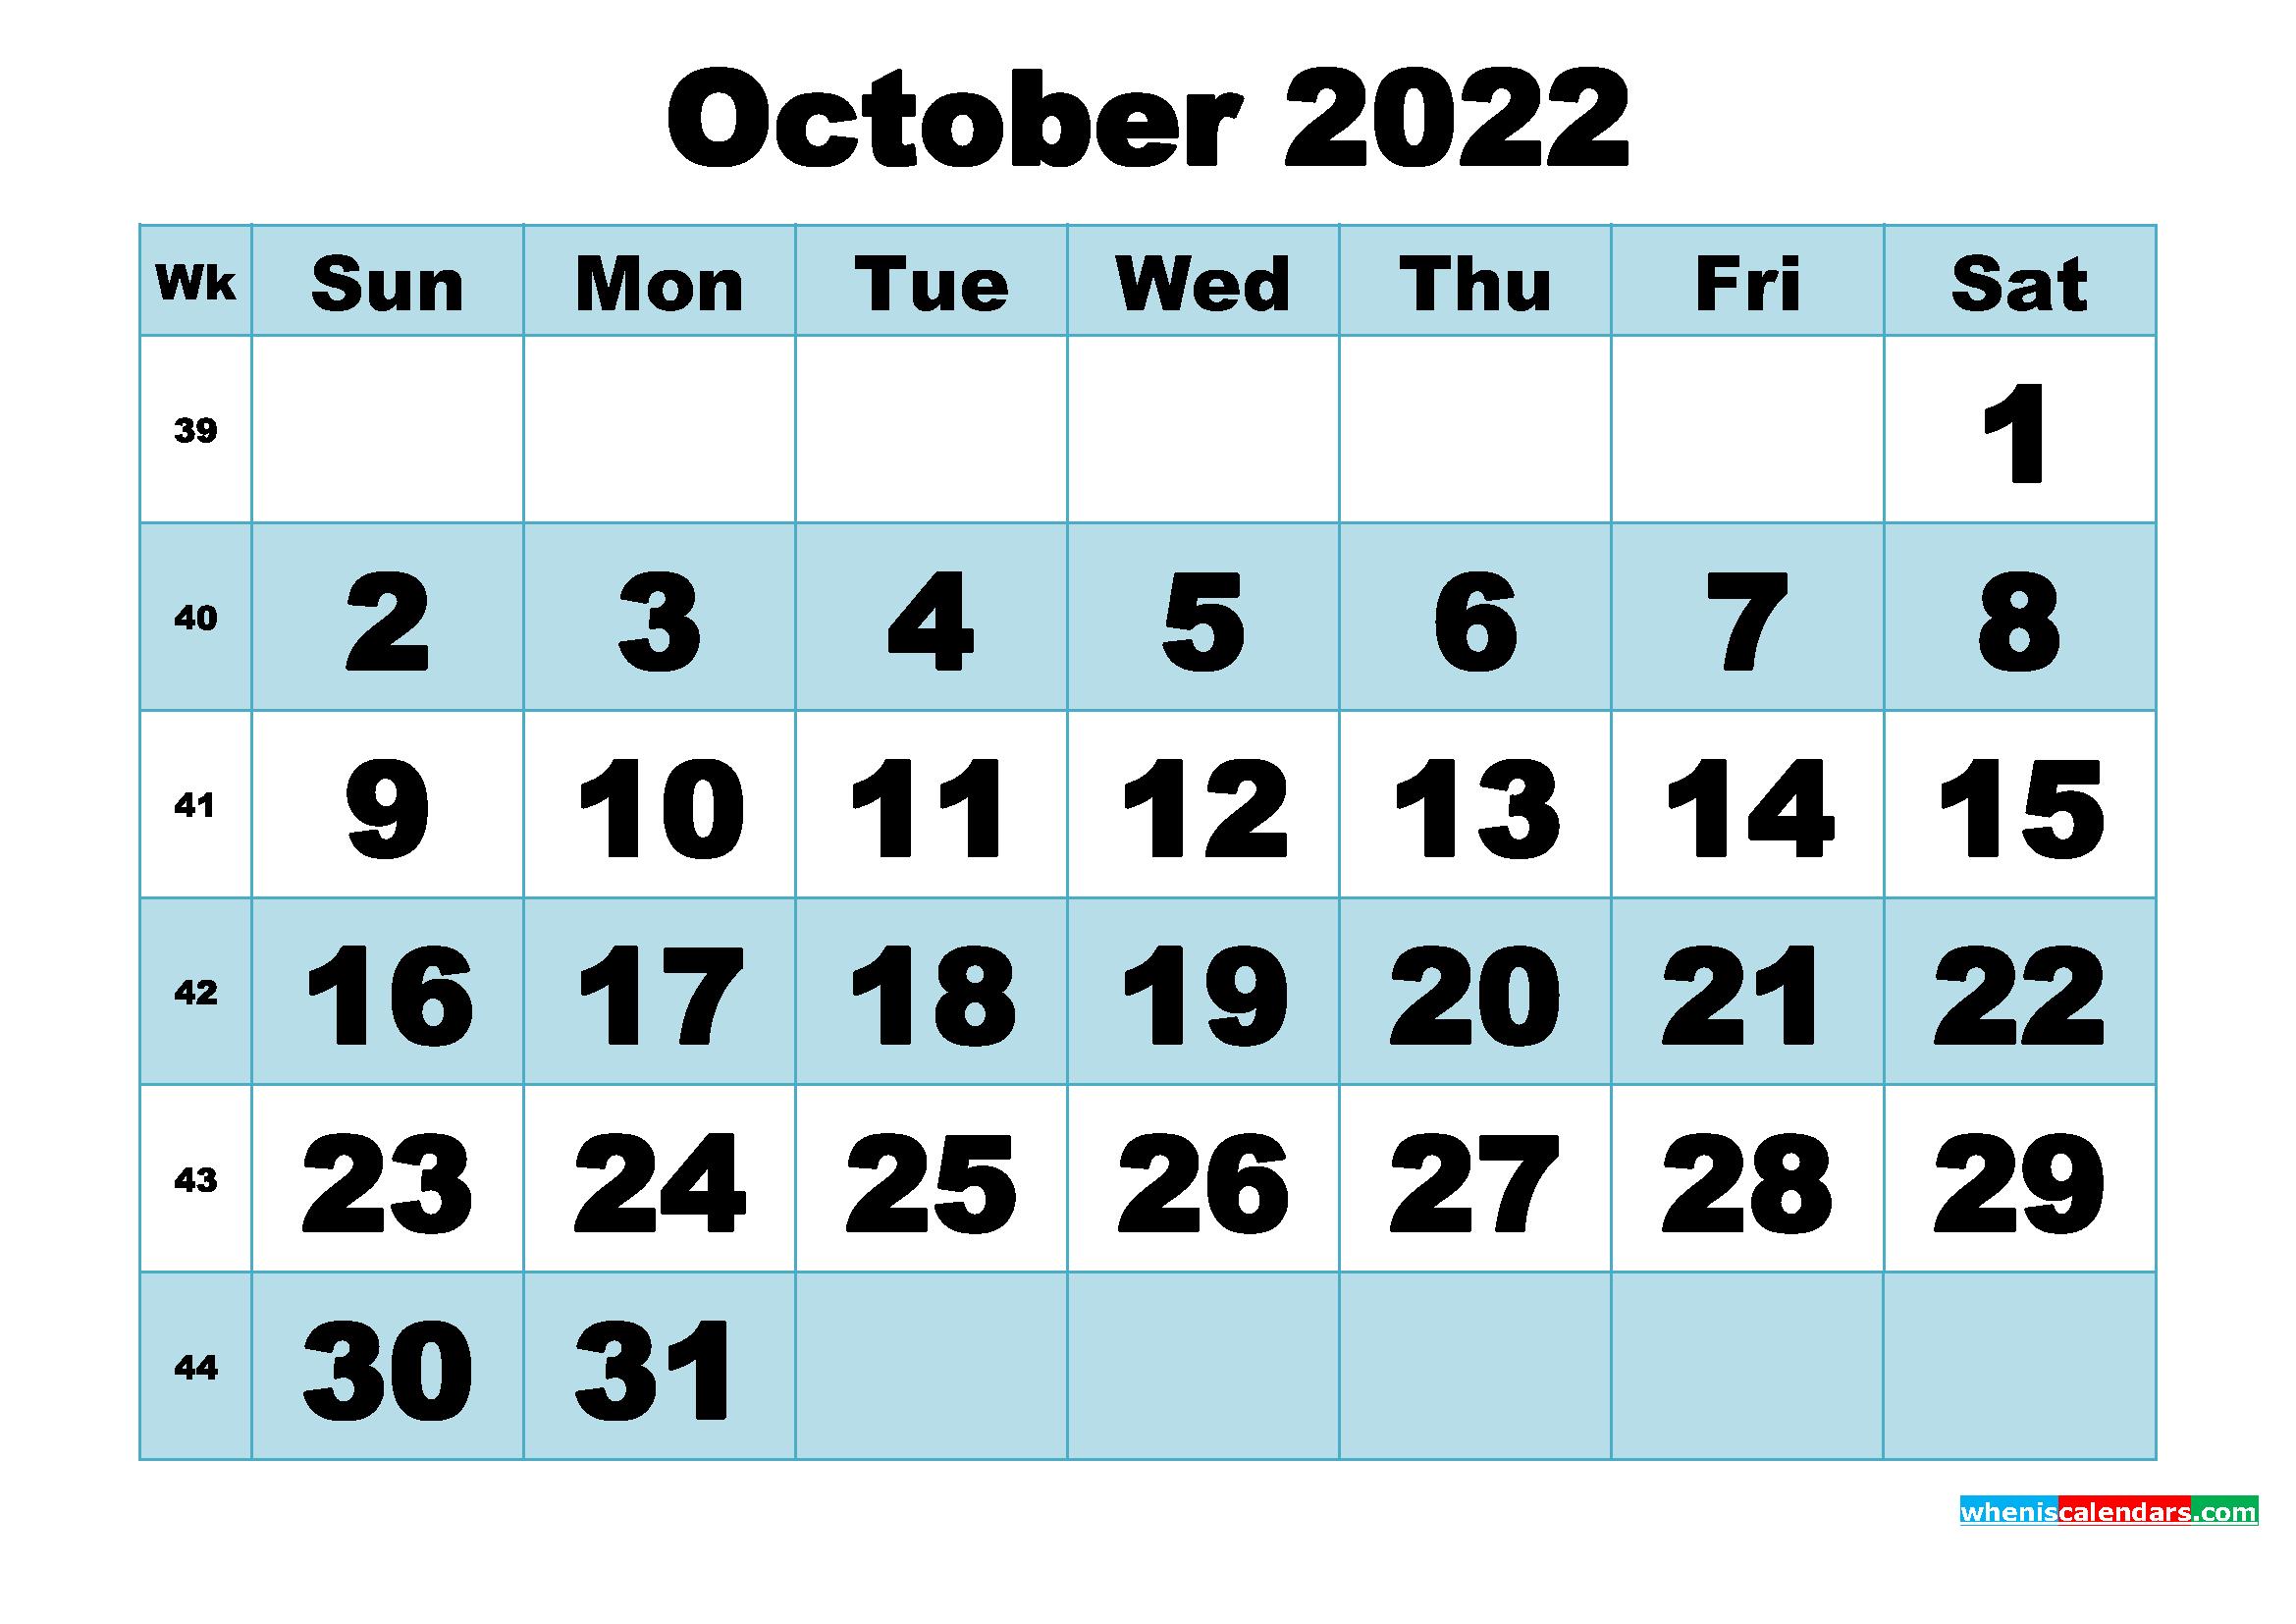 Free Printable October 2022 Calendar Word, PDF, Image ...